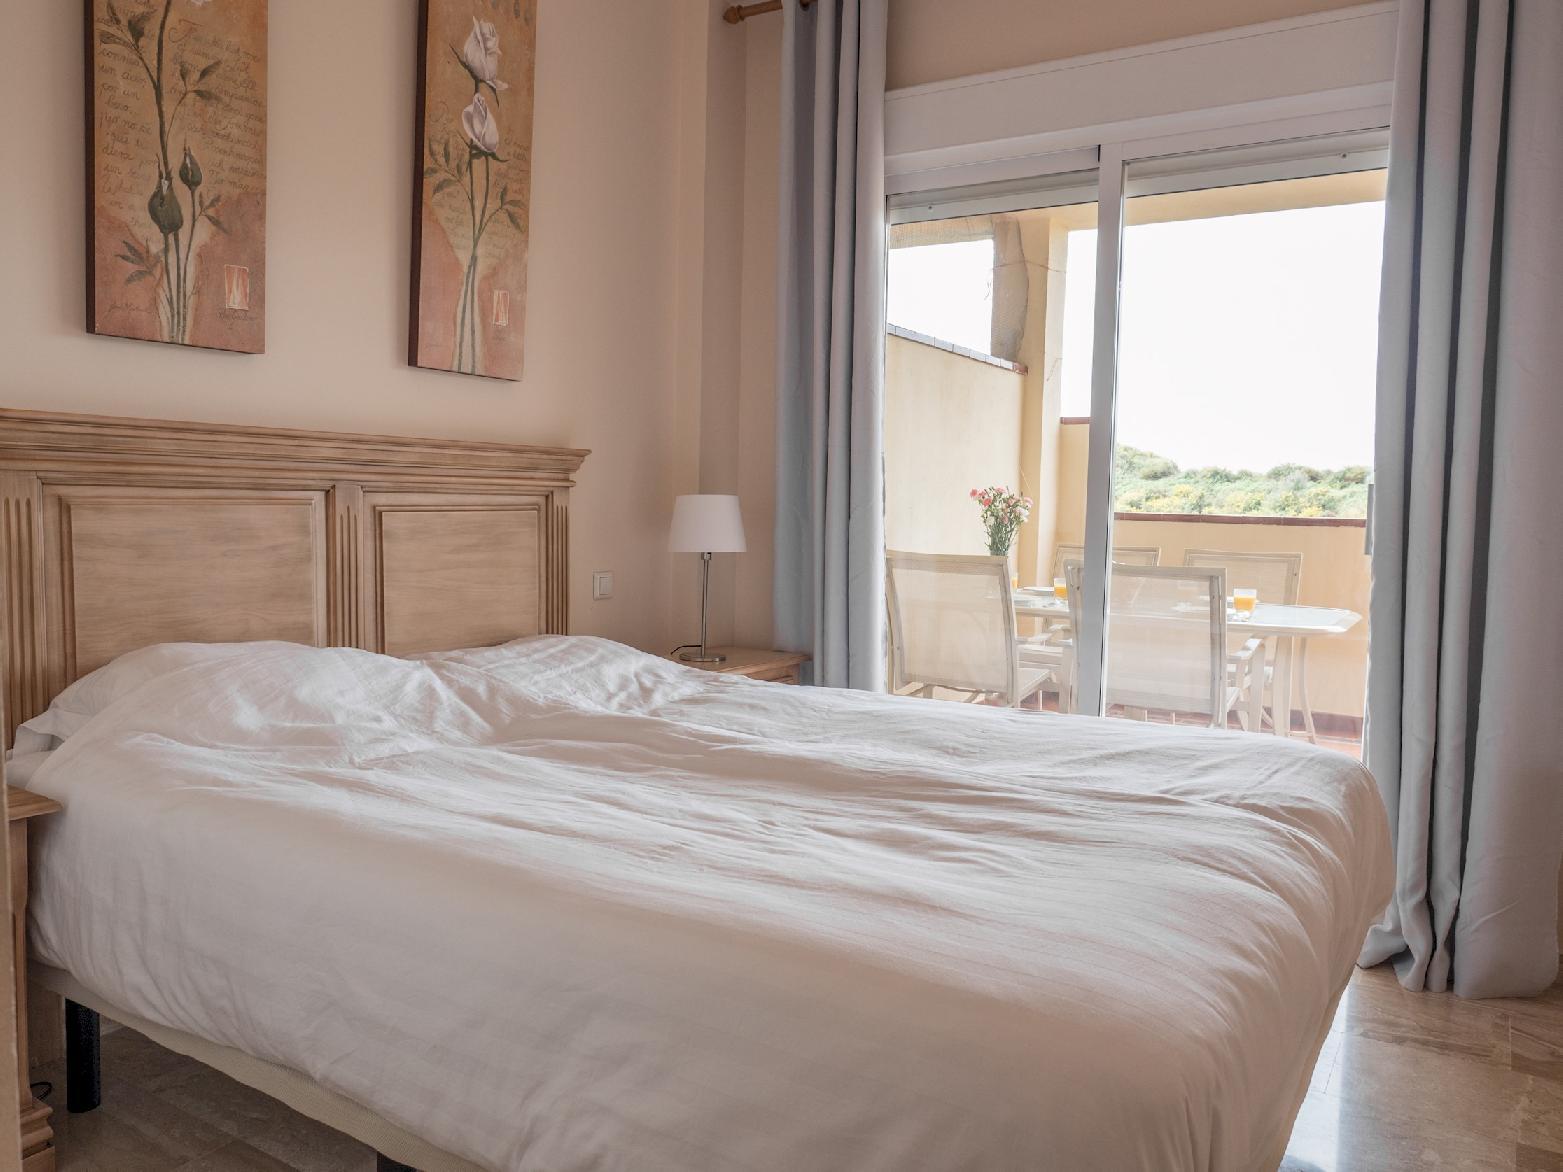 MalagaSuite Riviera Paradise photo 15418883